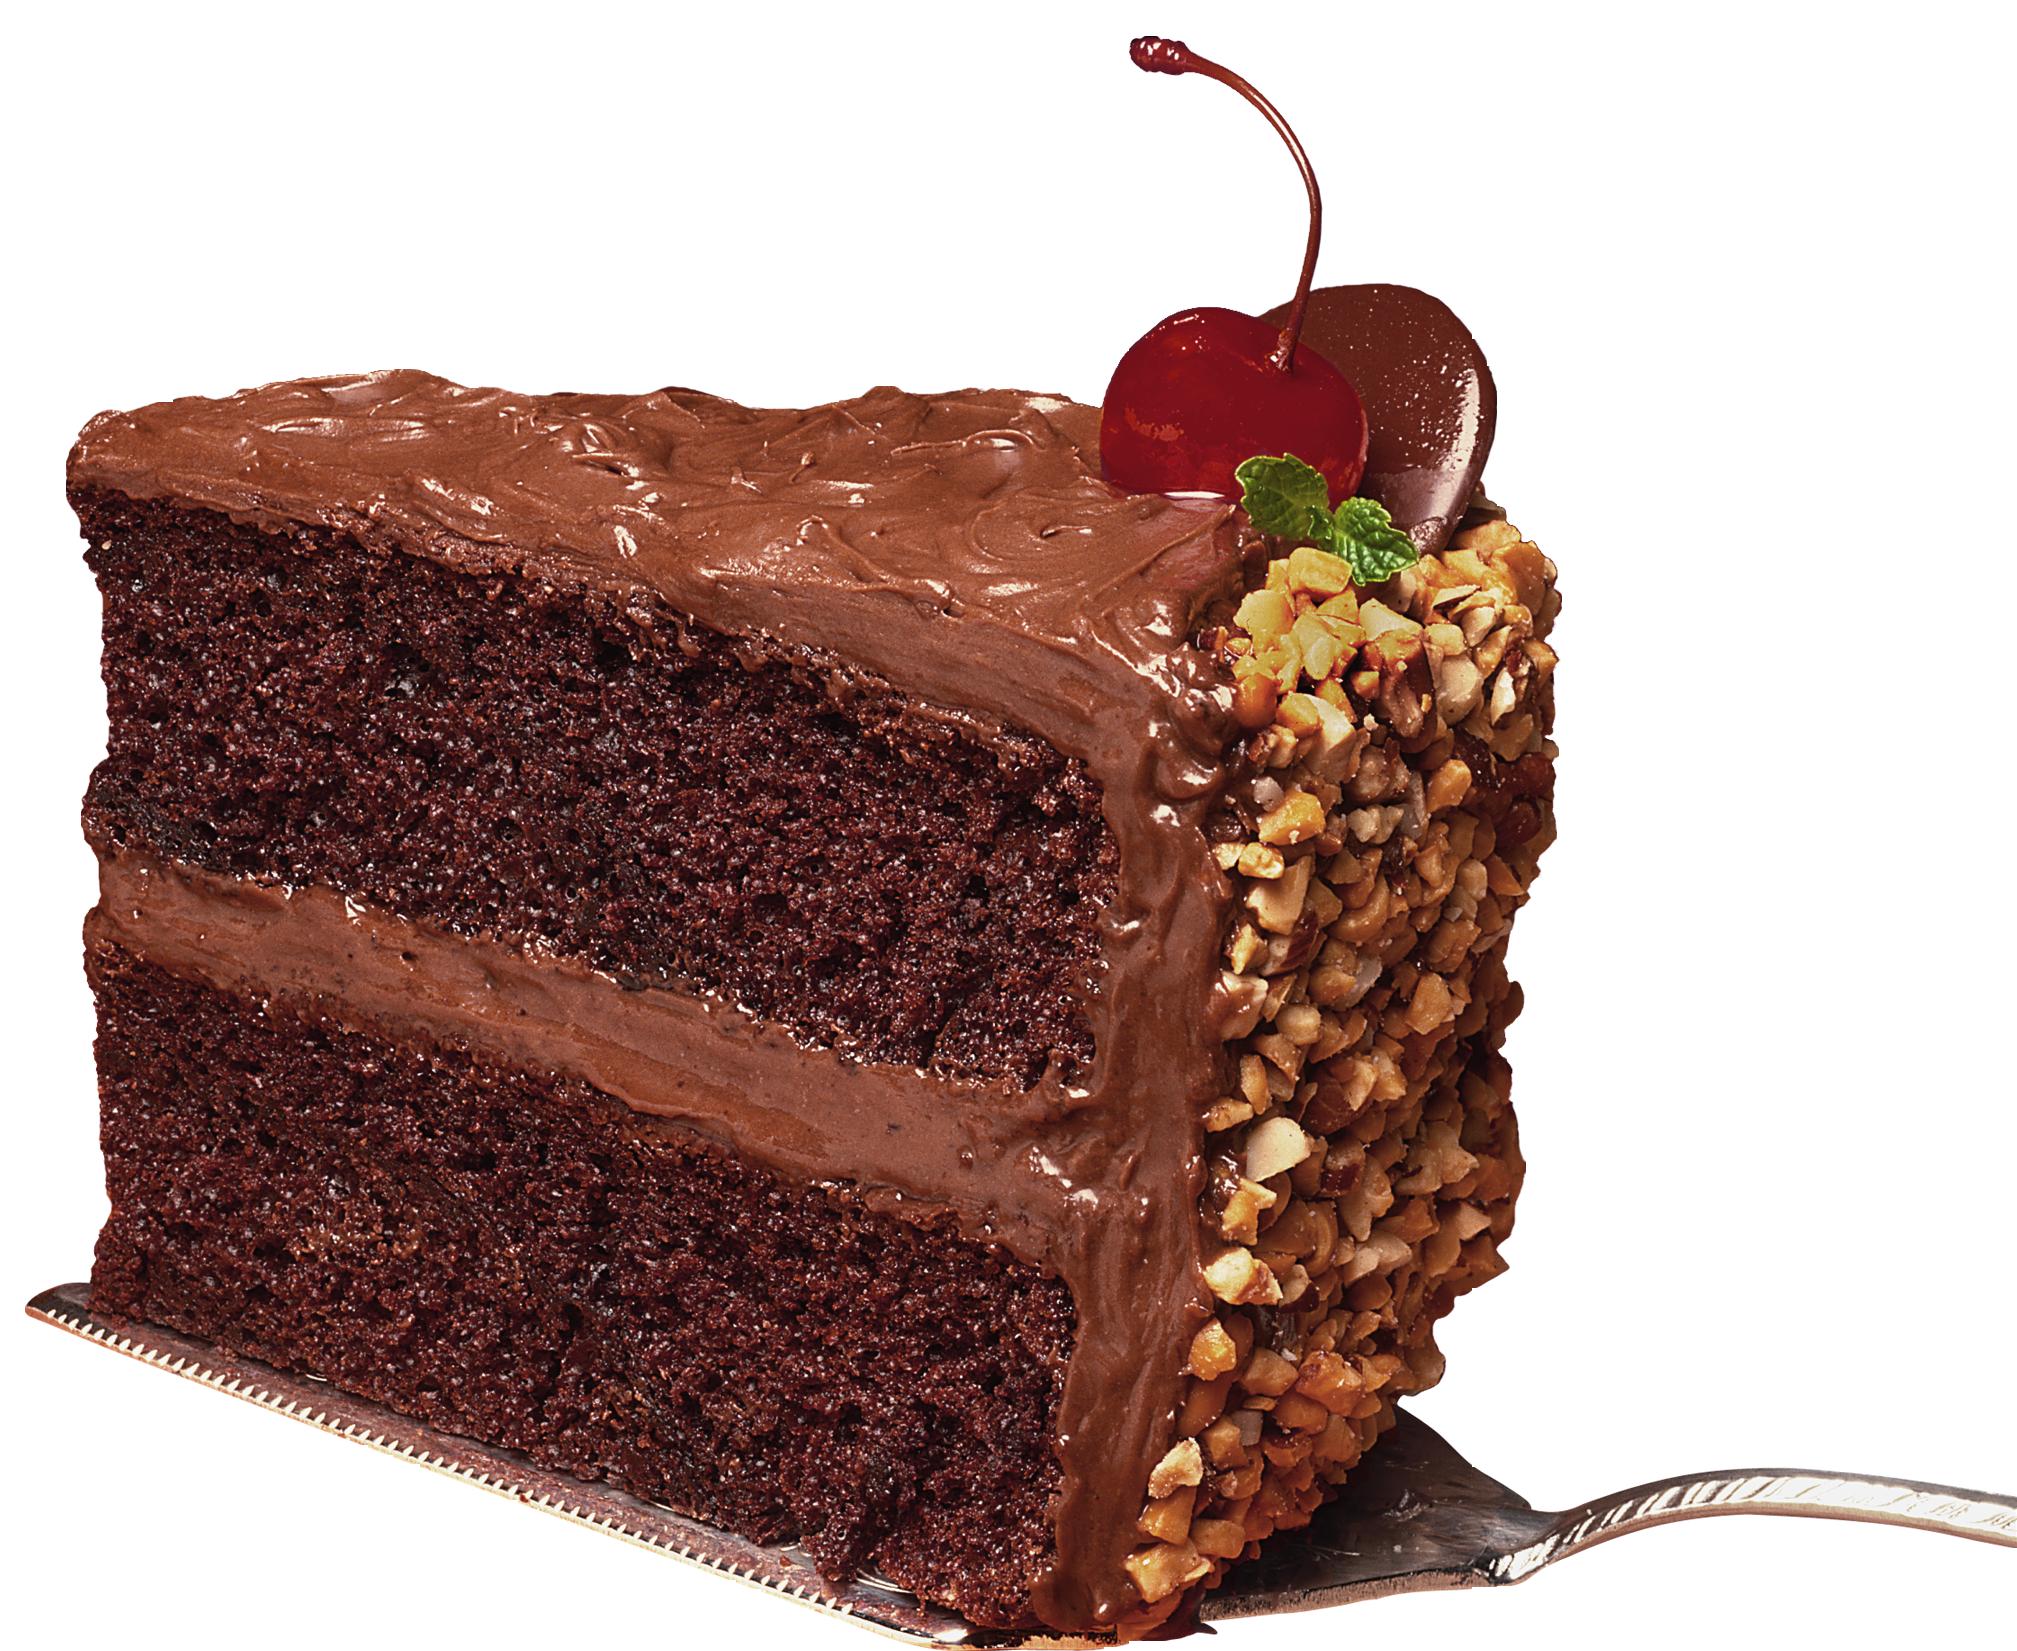 579 Birthday Cake Clip Art Images Public Domain Vectors